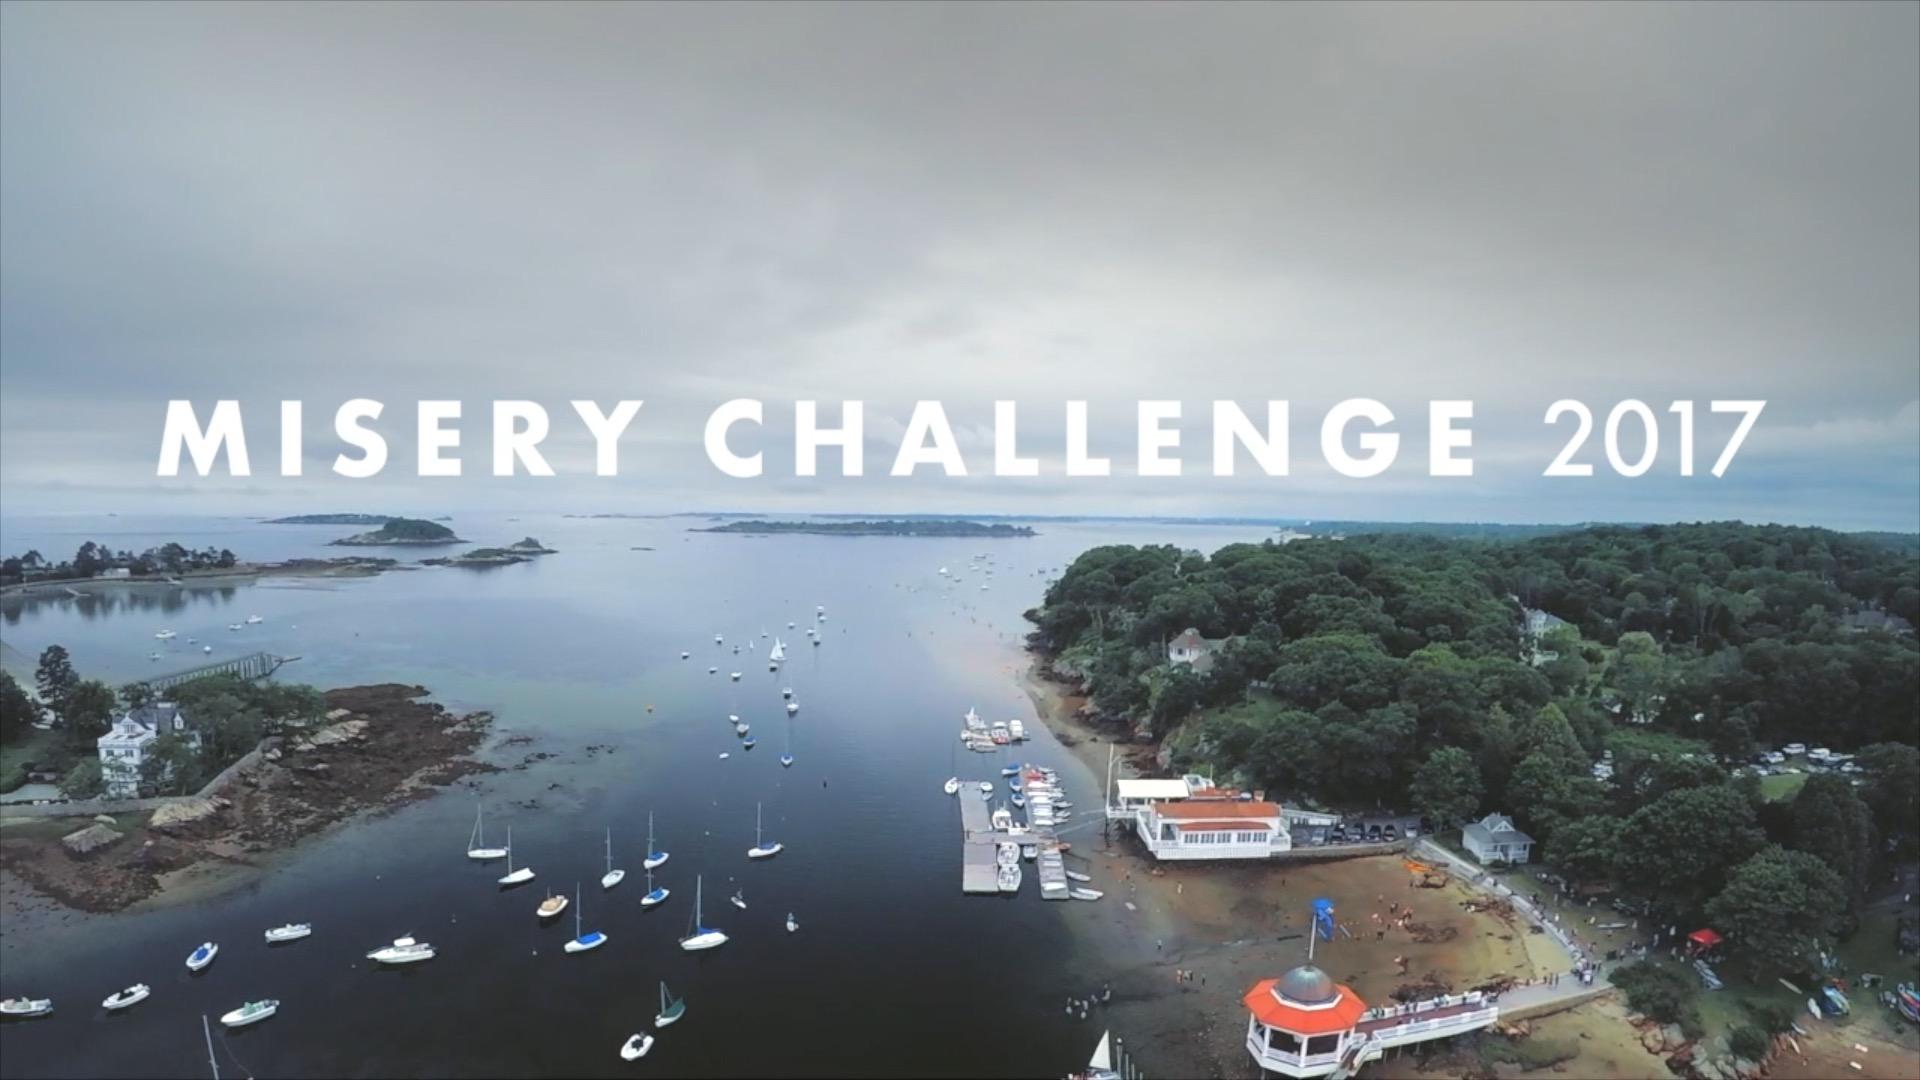 Misery Challenge 2017